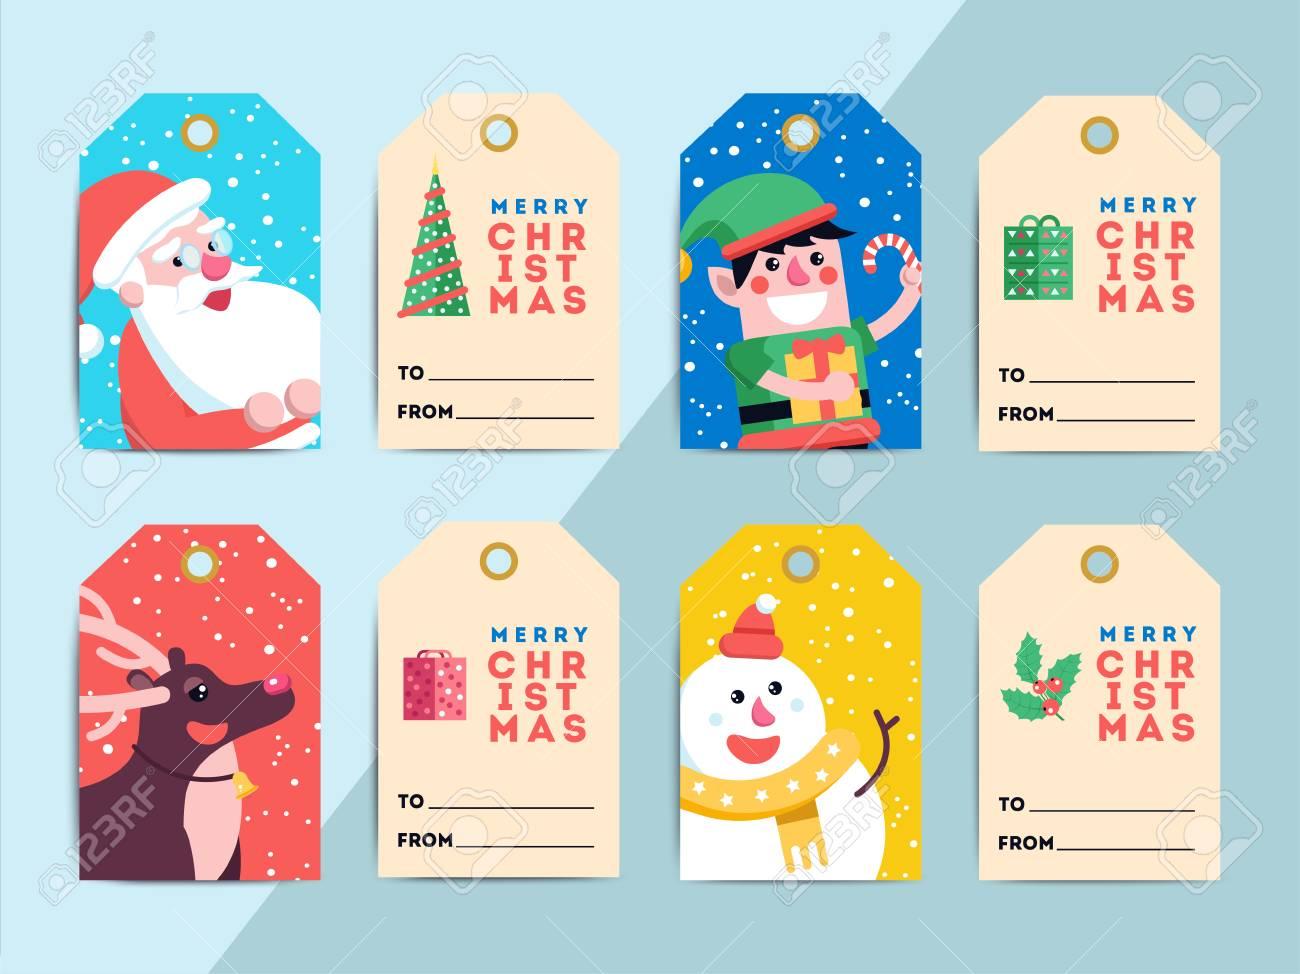 photo about Printable Christmas Gift Tags titled Xmas reward tags template established. Vector printable christmas box or..